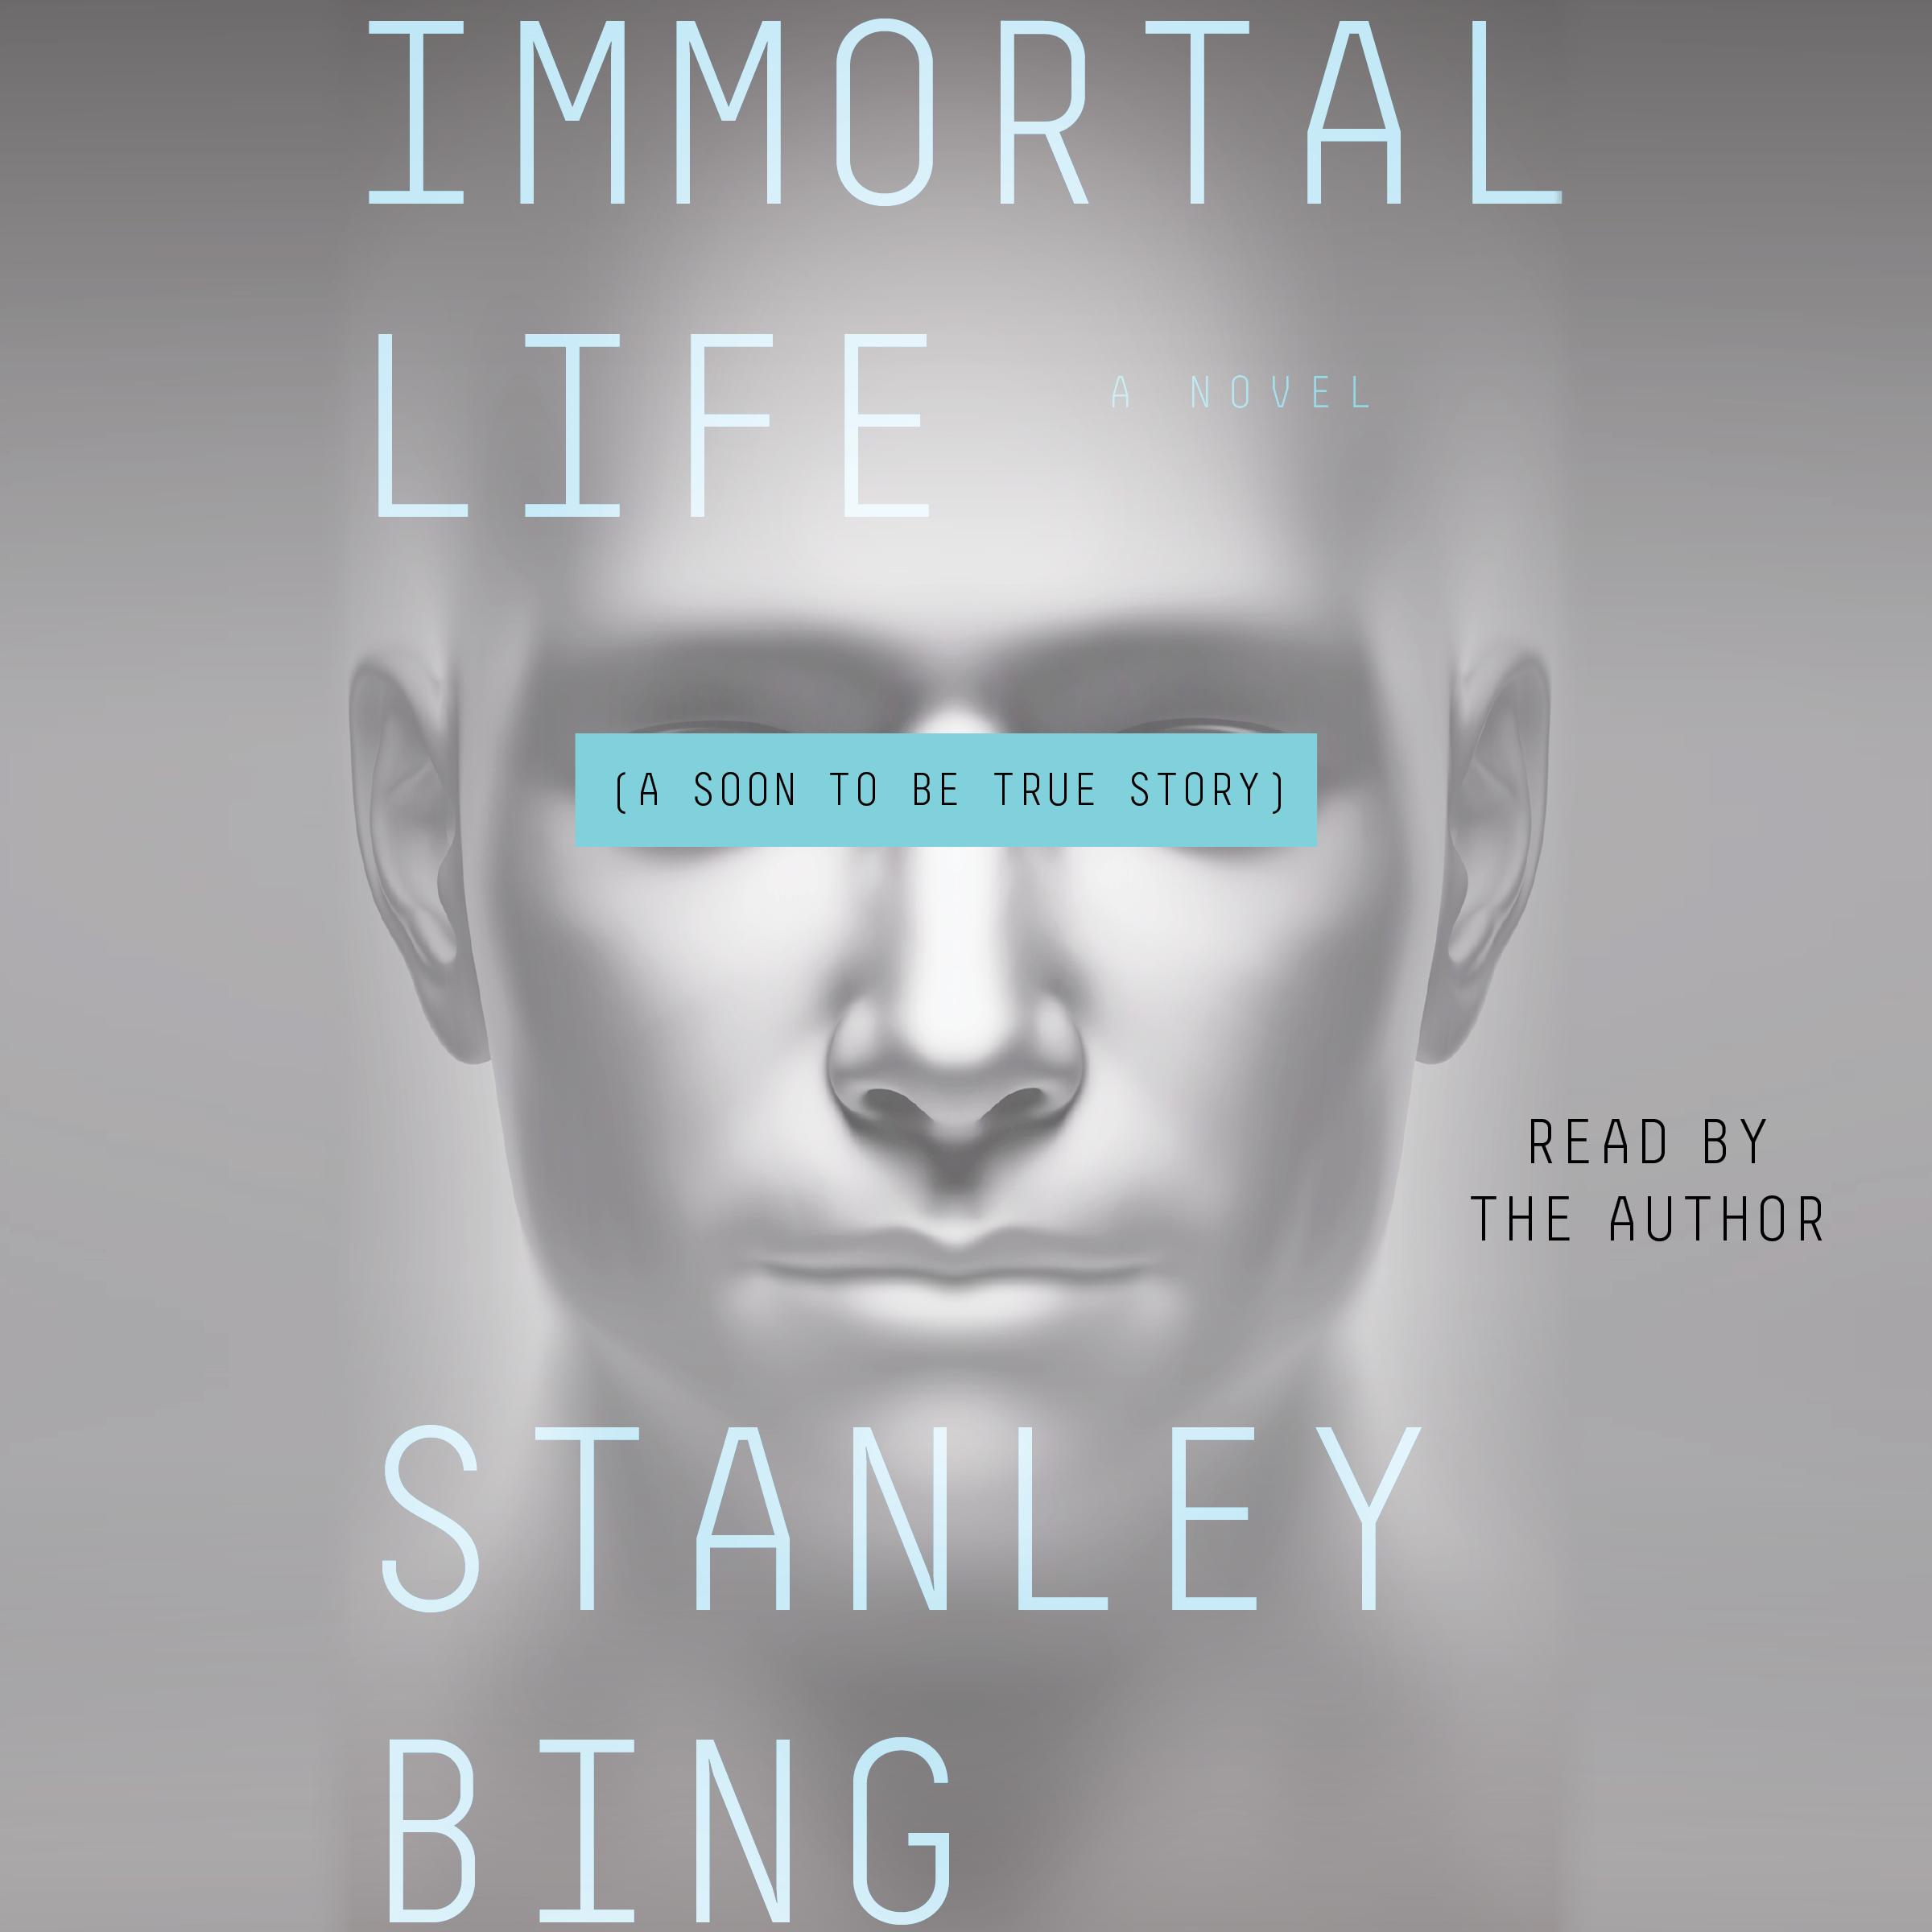 Immortal life 9781508243670 hr